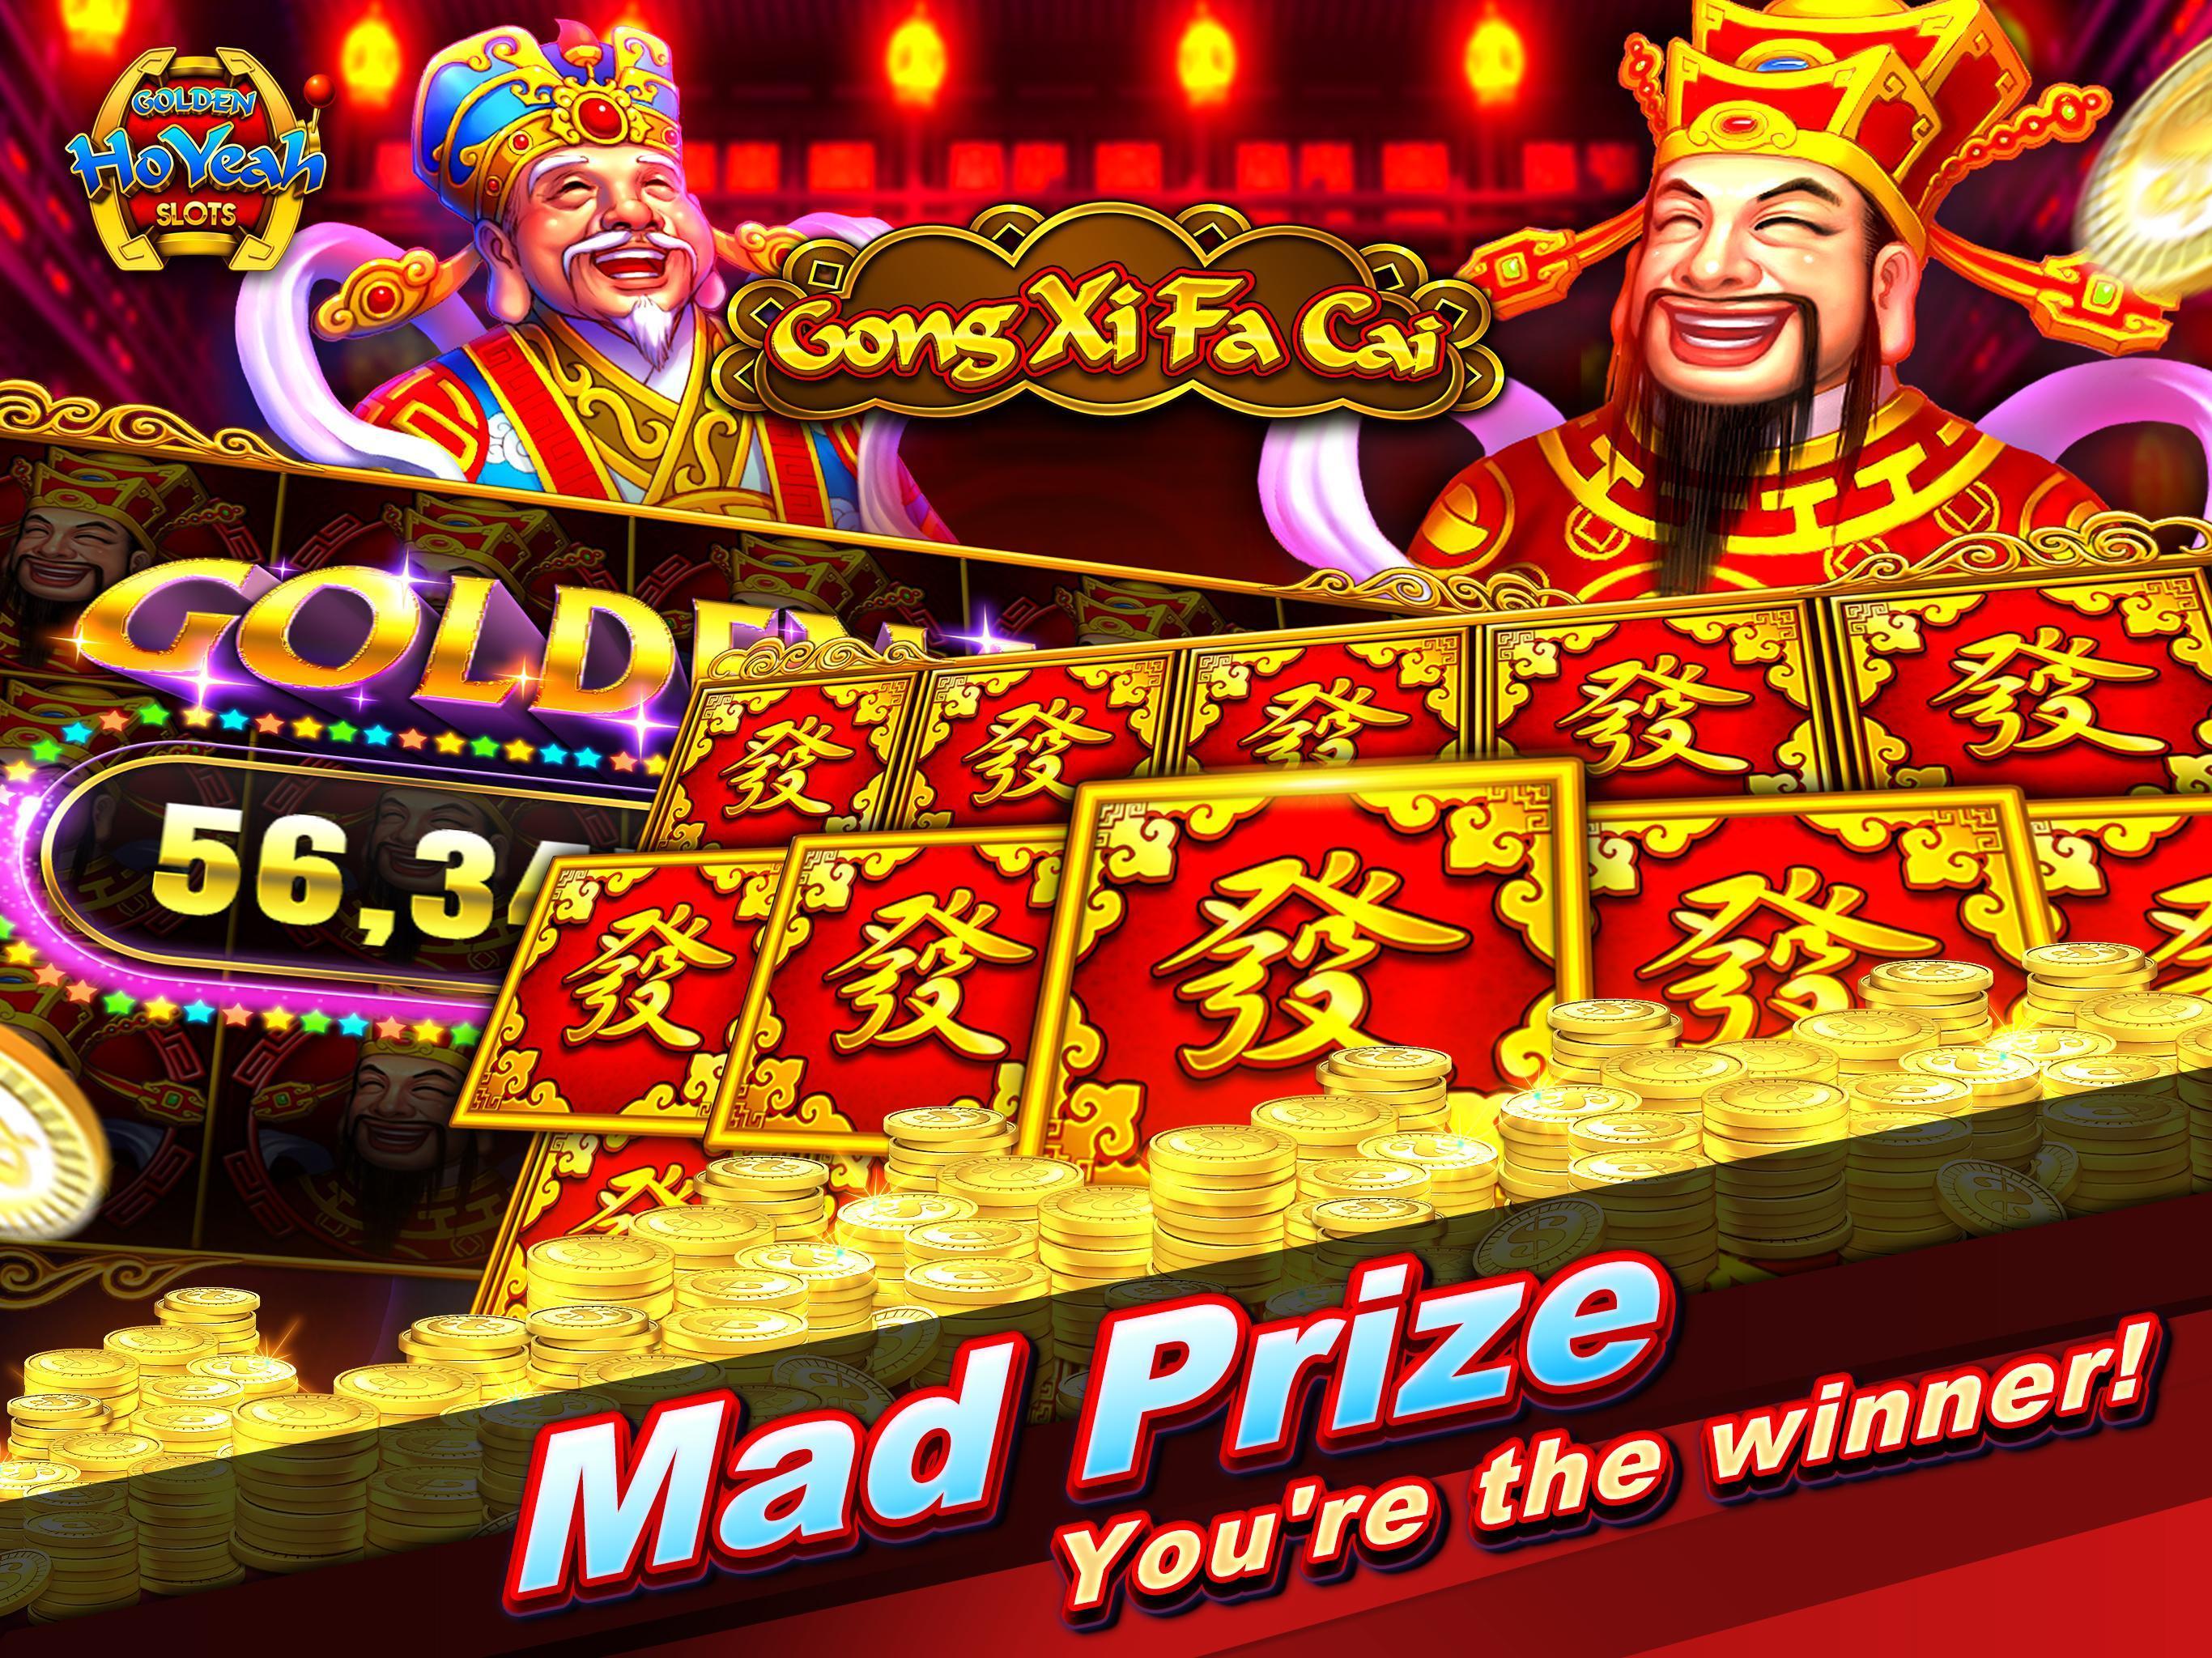 Slots (Golden HoYeah) - Casino Slots 2.5.7 Screenshot 4